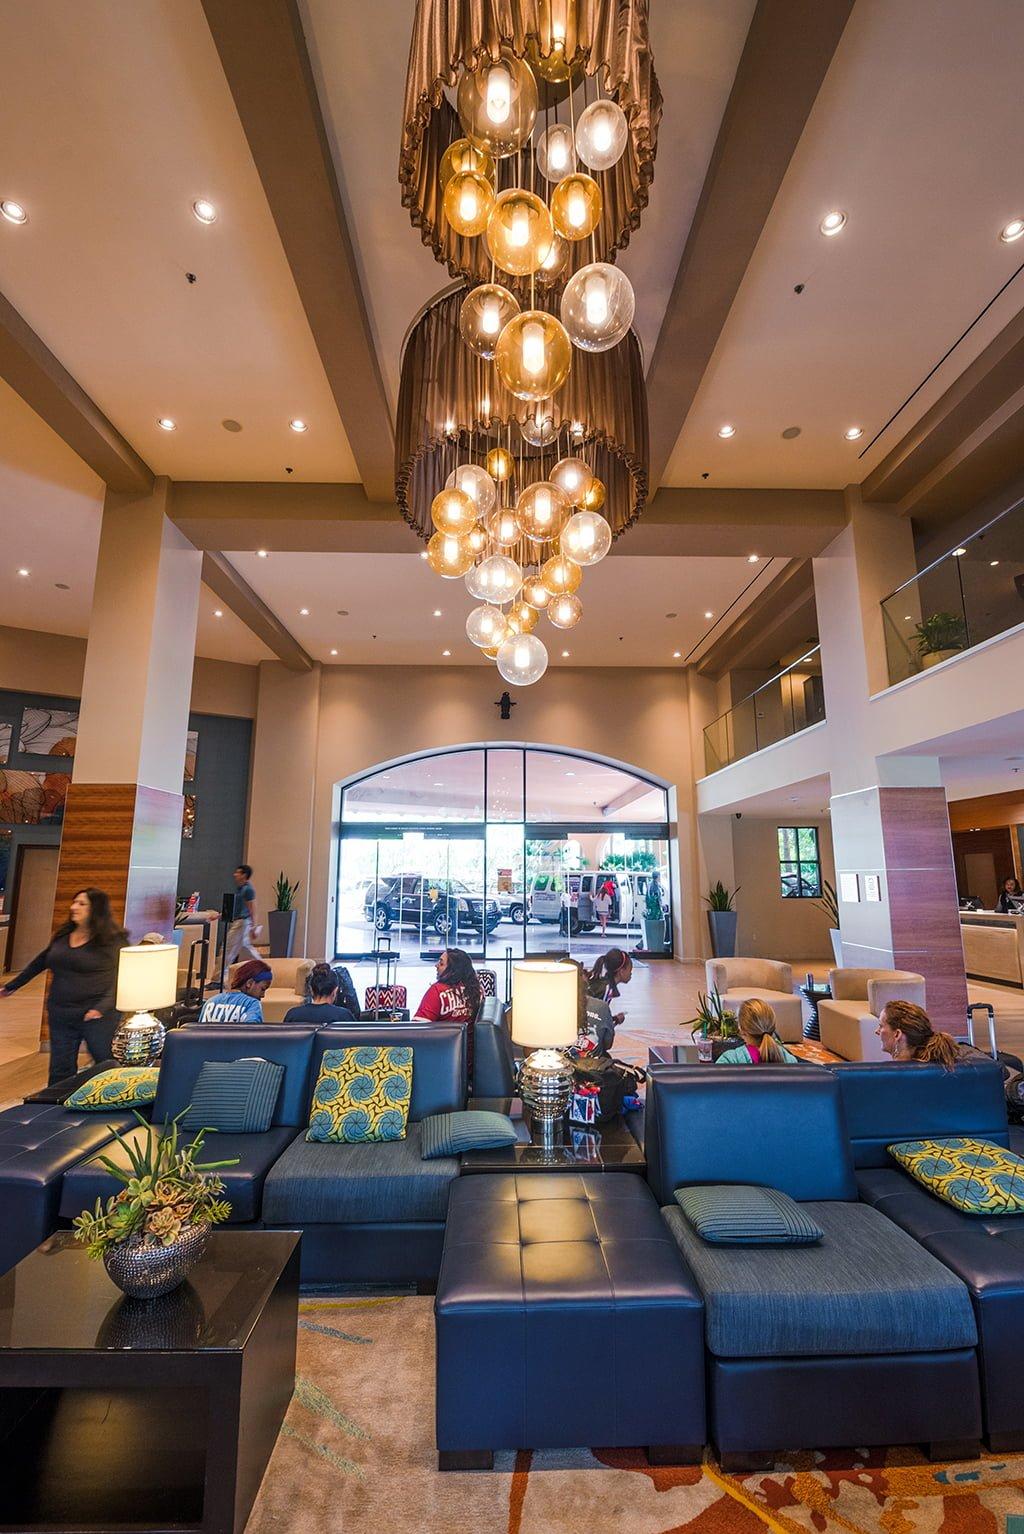 Disneyland Good Neighbor Hotel Review: Wyndham Anaheim - Disney ...